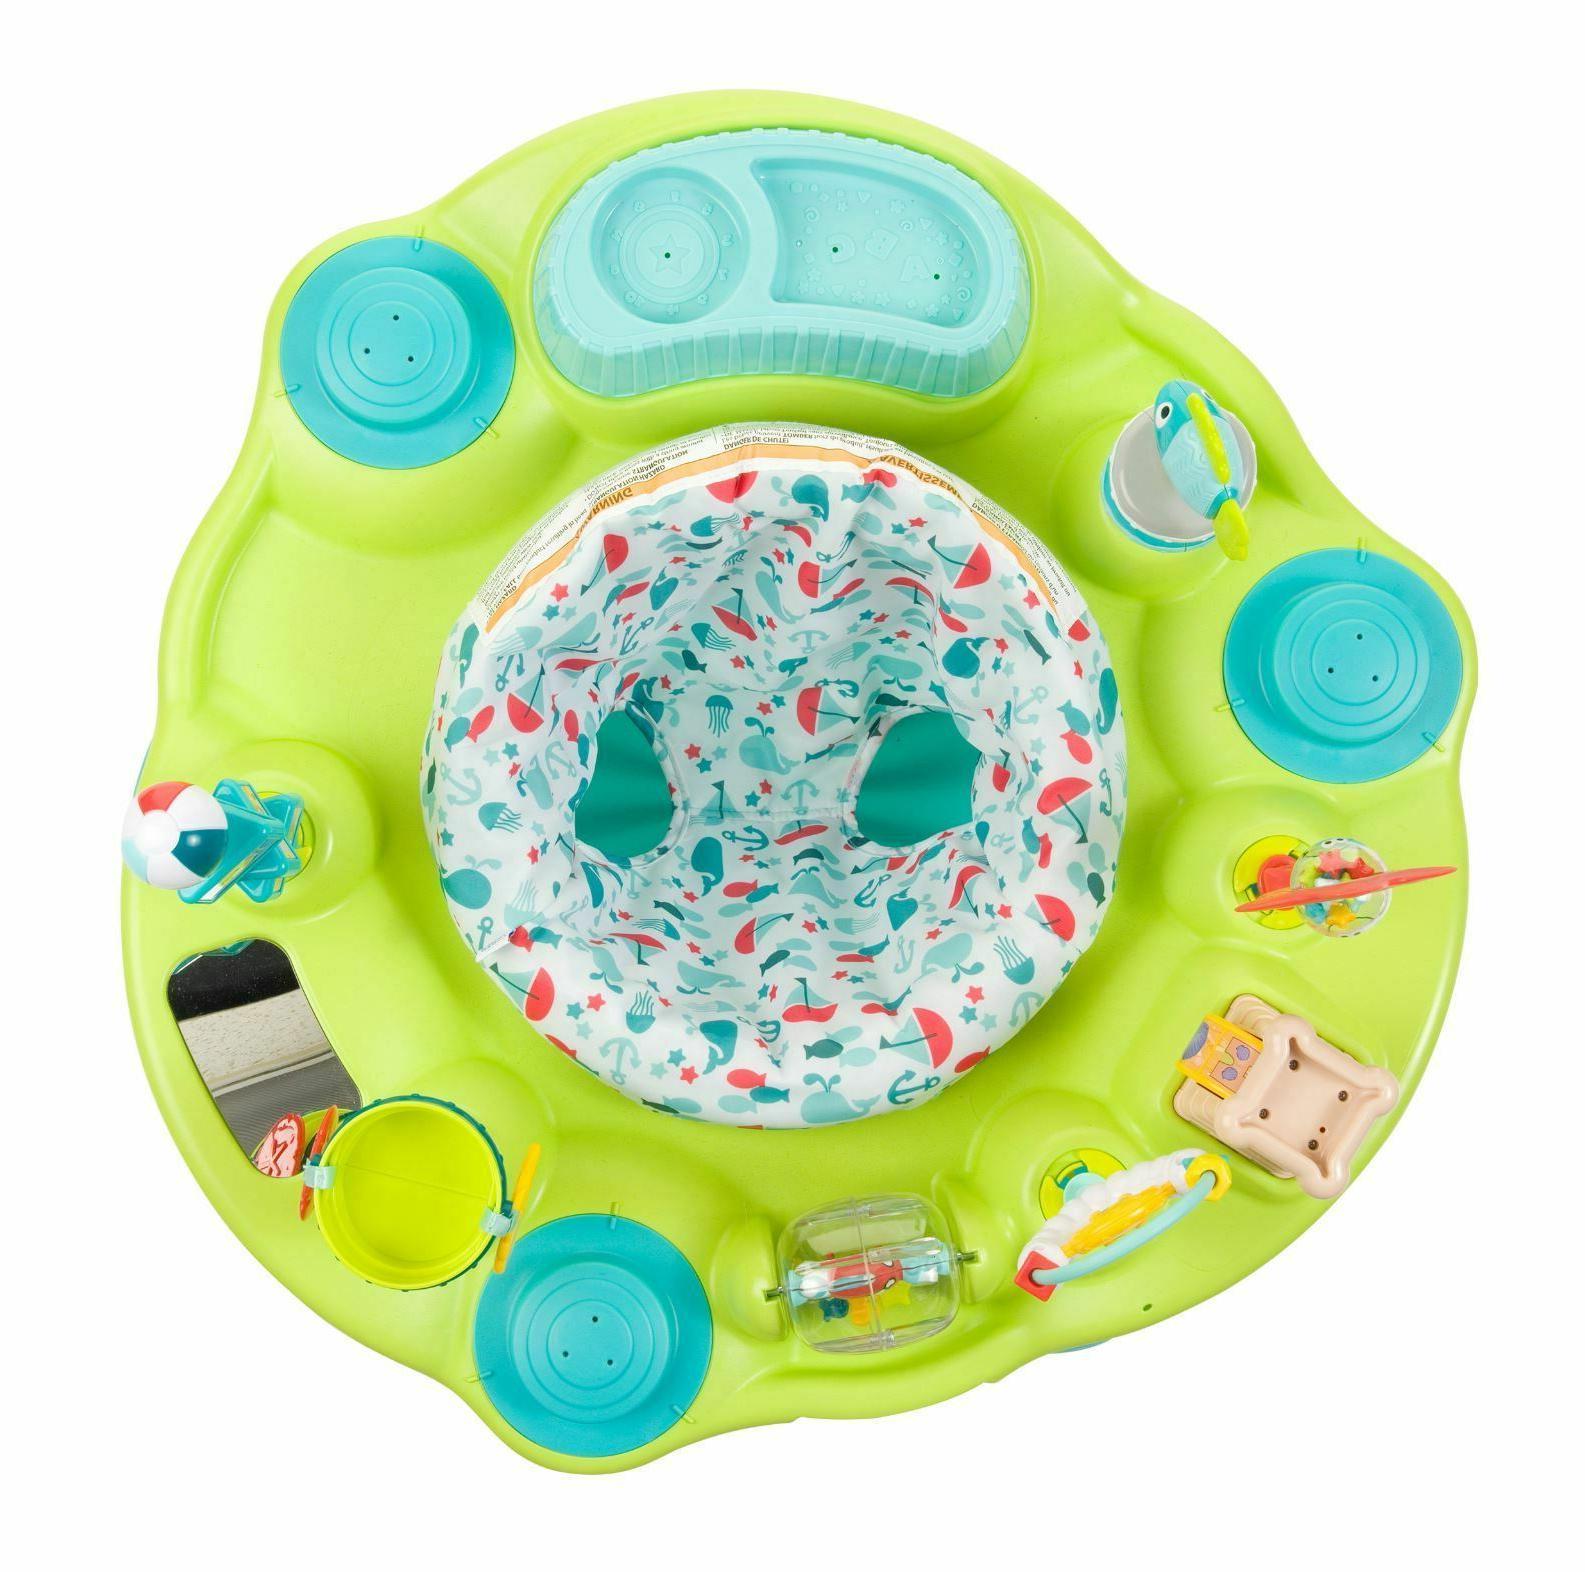 Baby Center Learn Entertain Evenflo